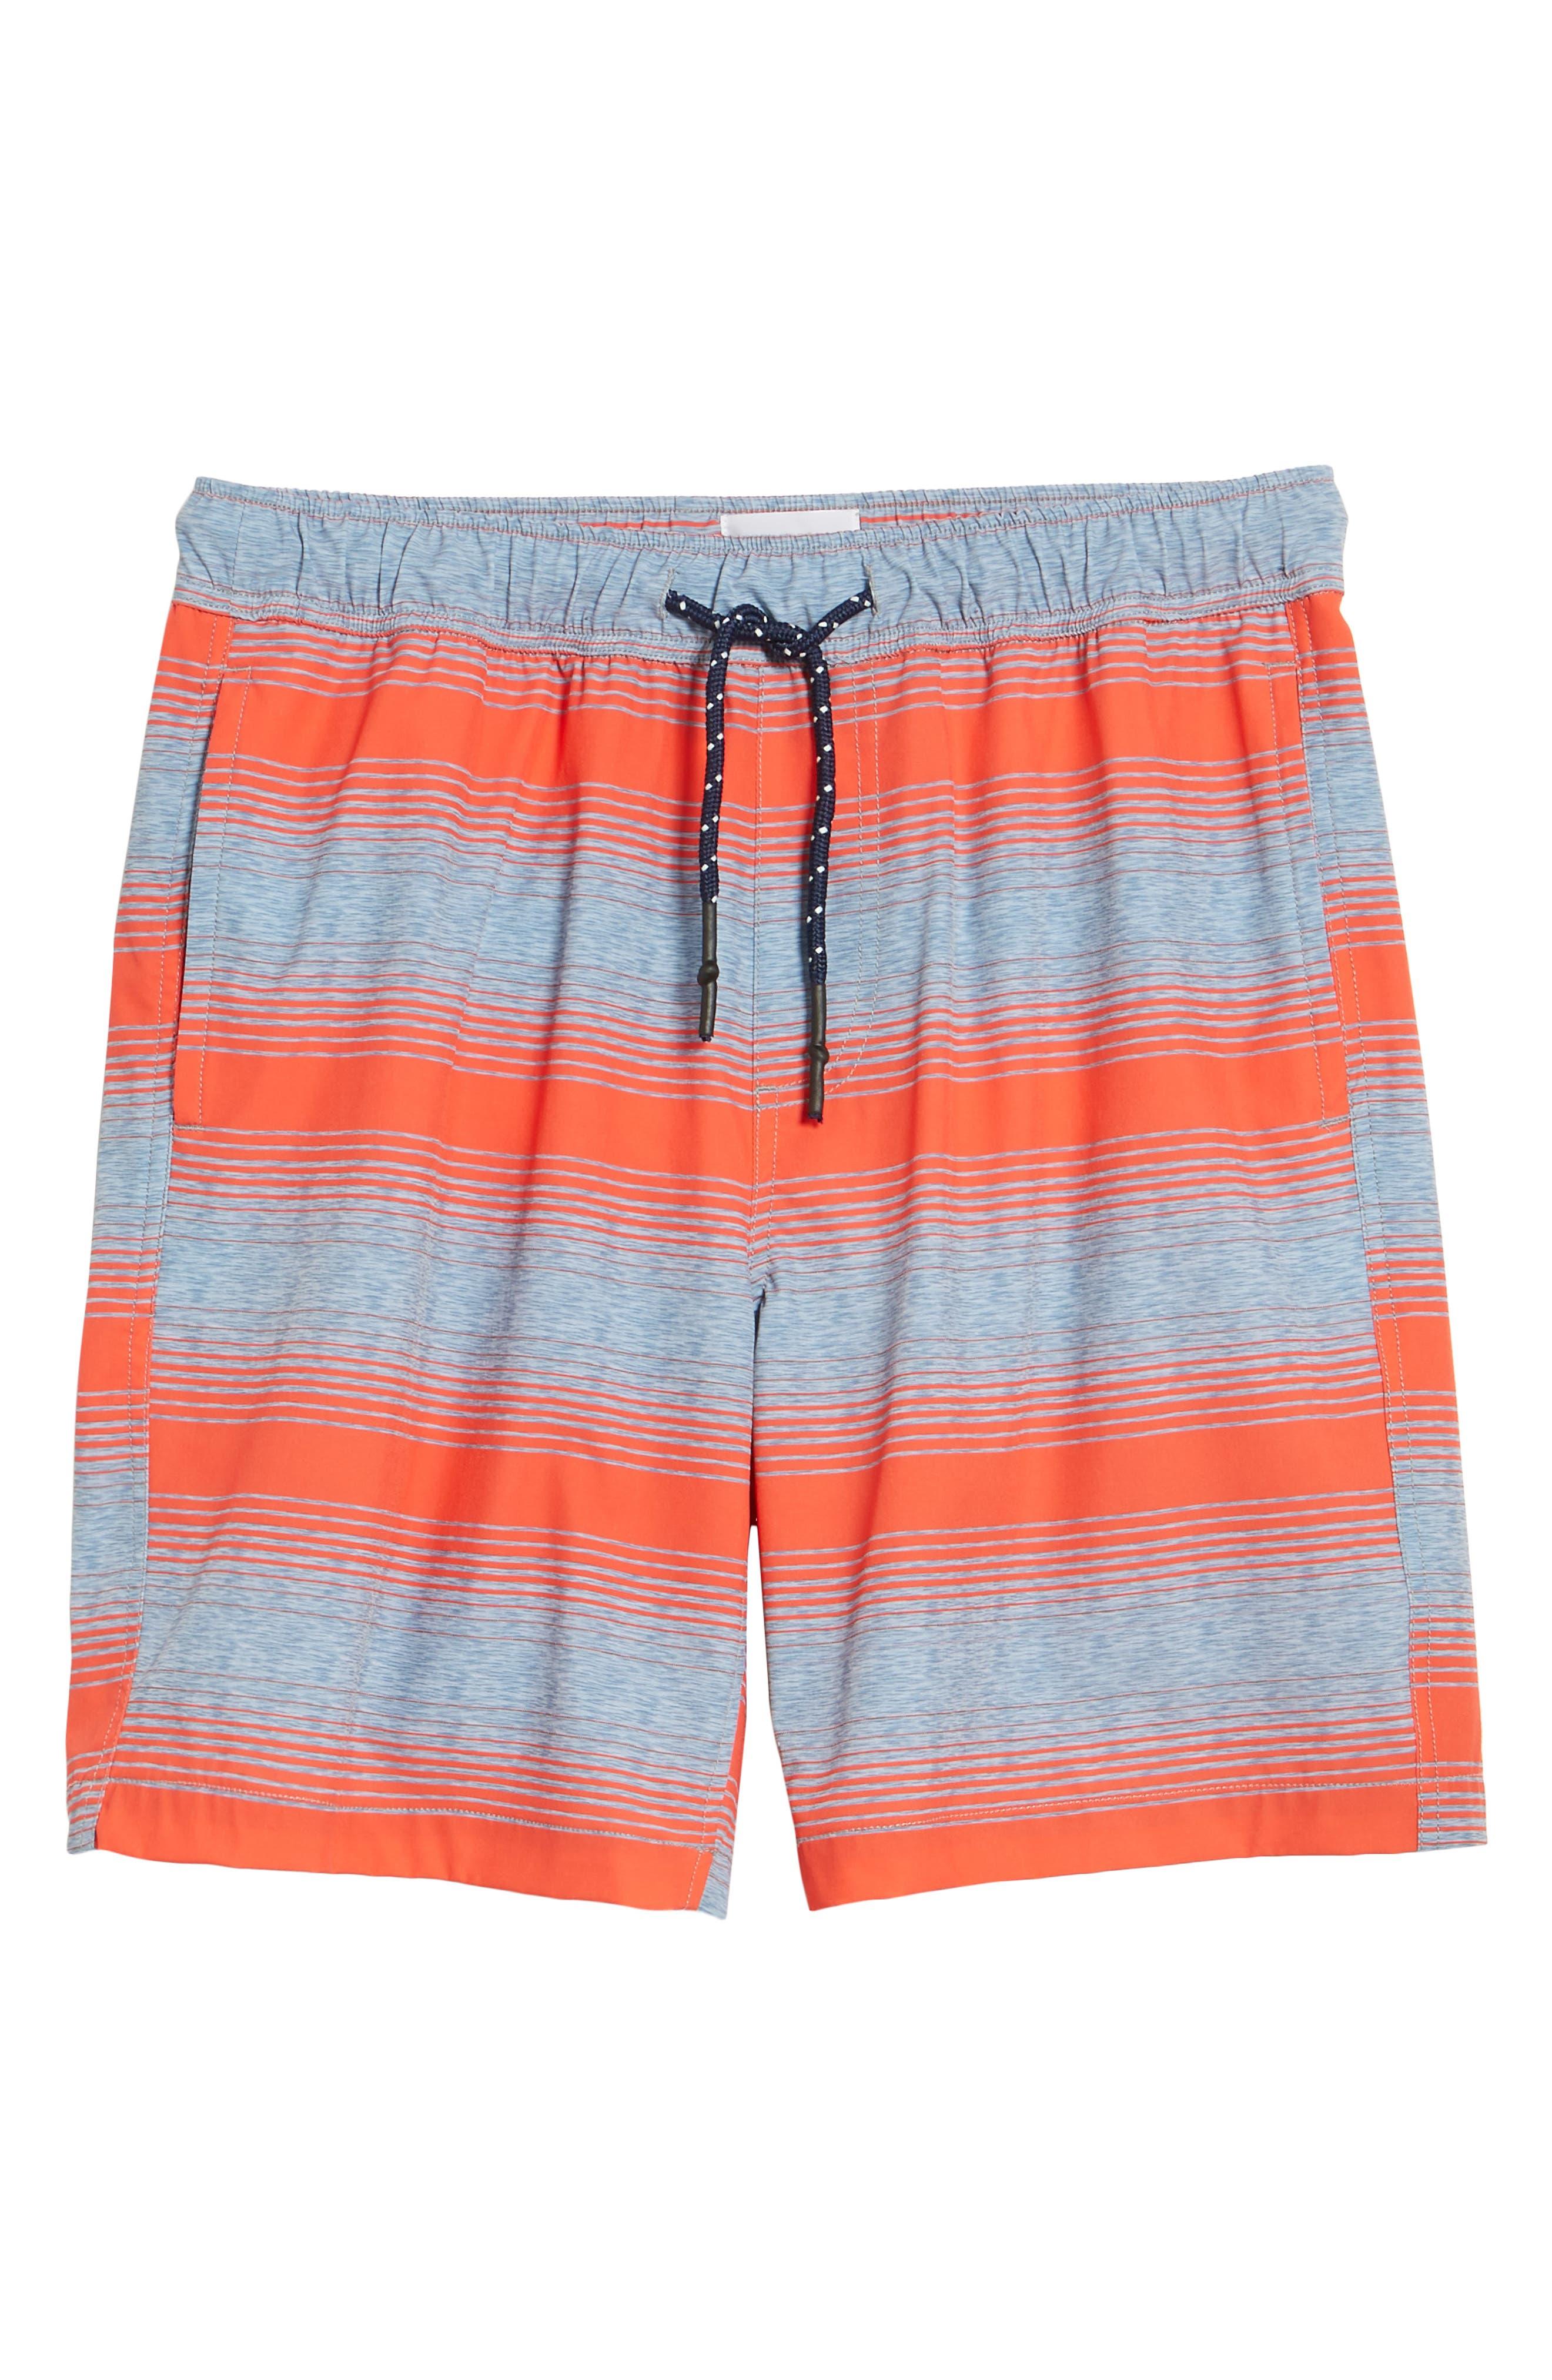 Stripe Swim Trunks,                             Alternate thumbnail 6, color,                             Hot Coral